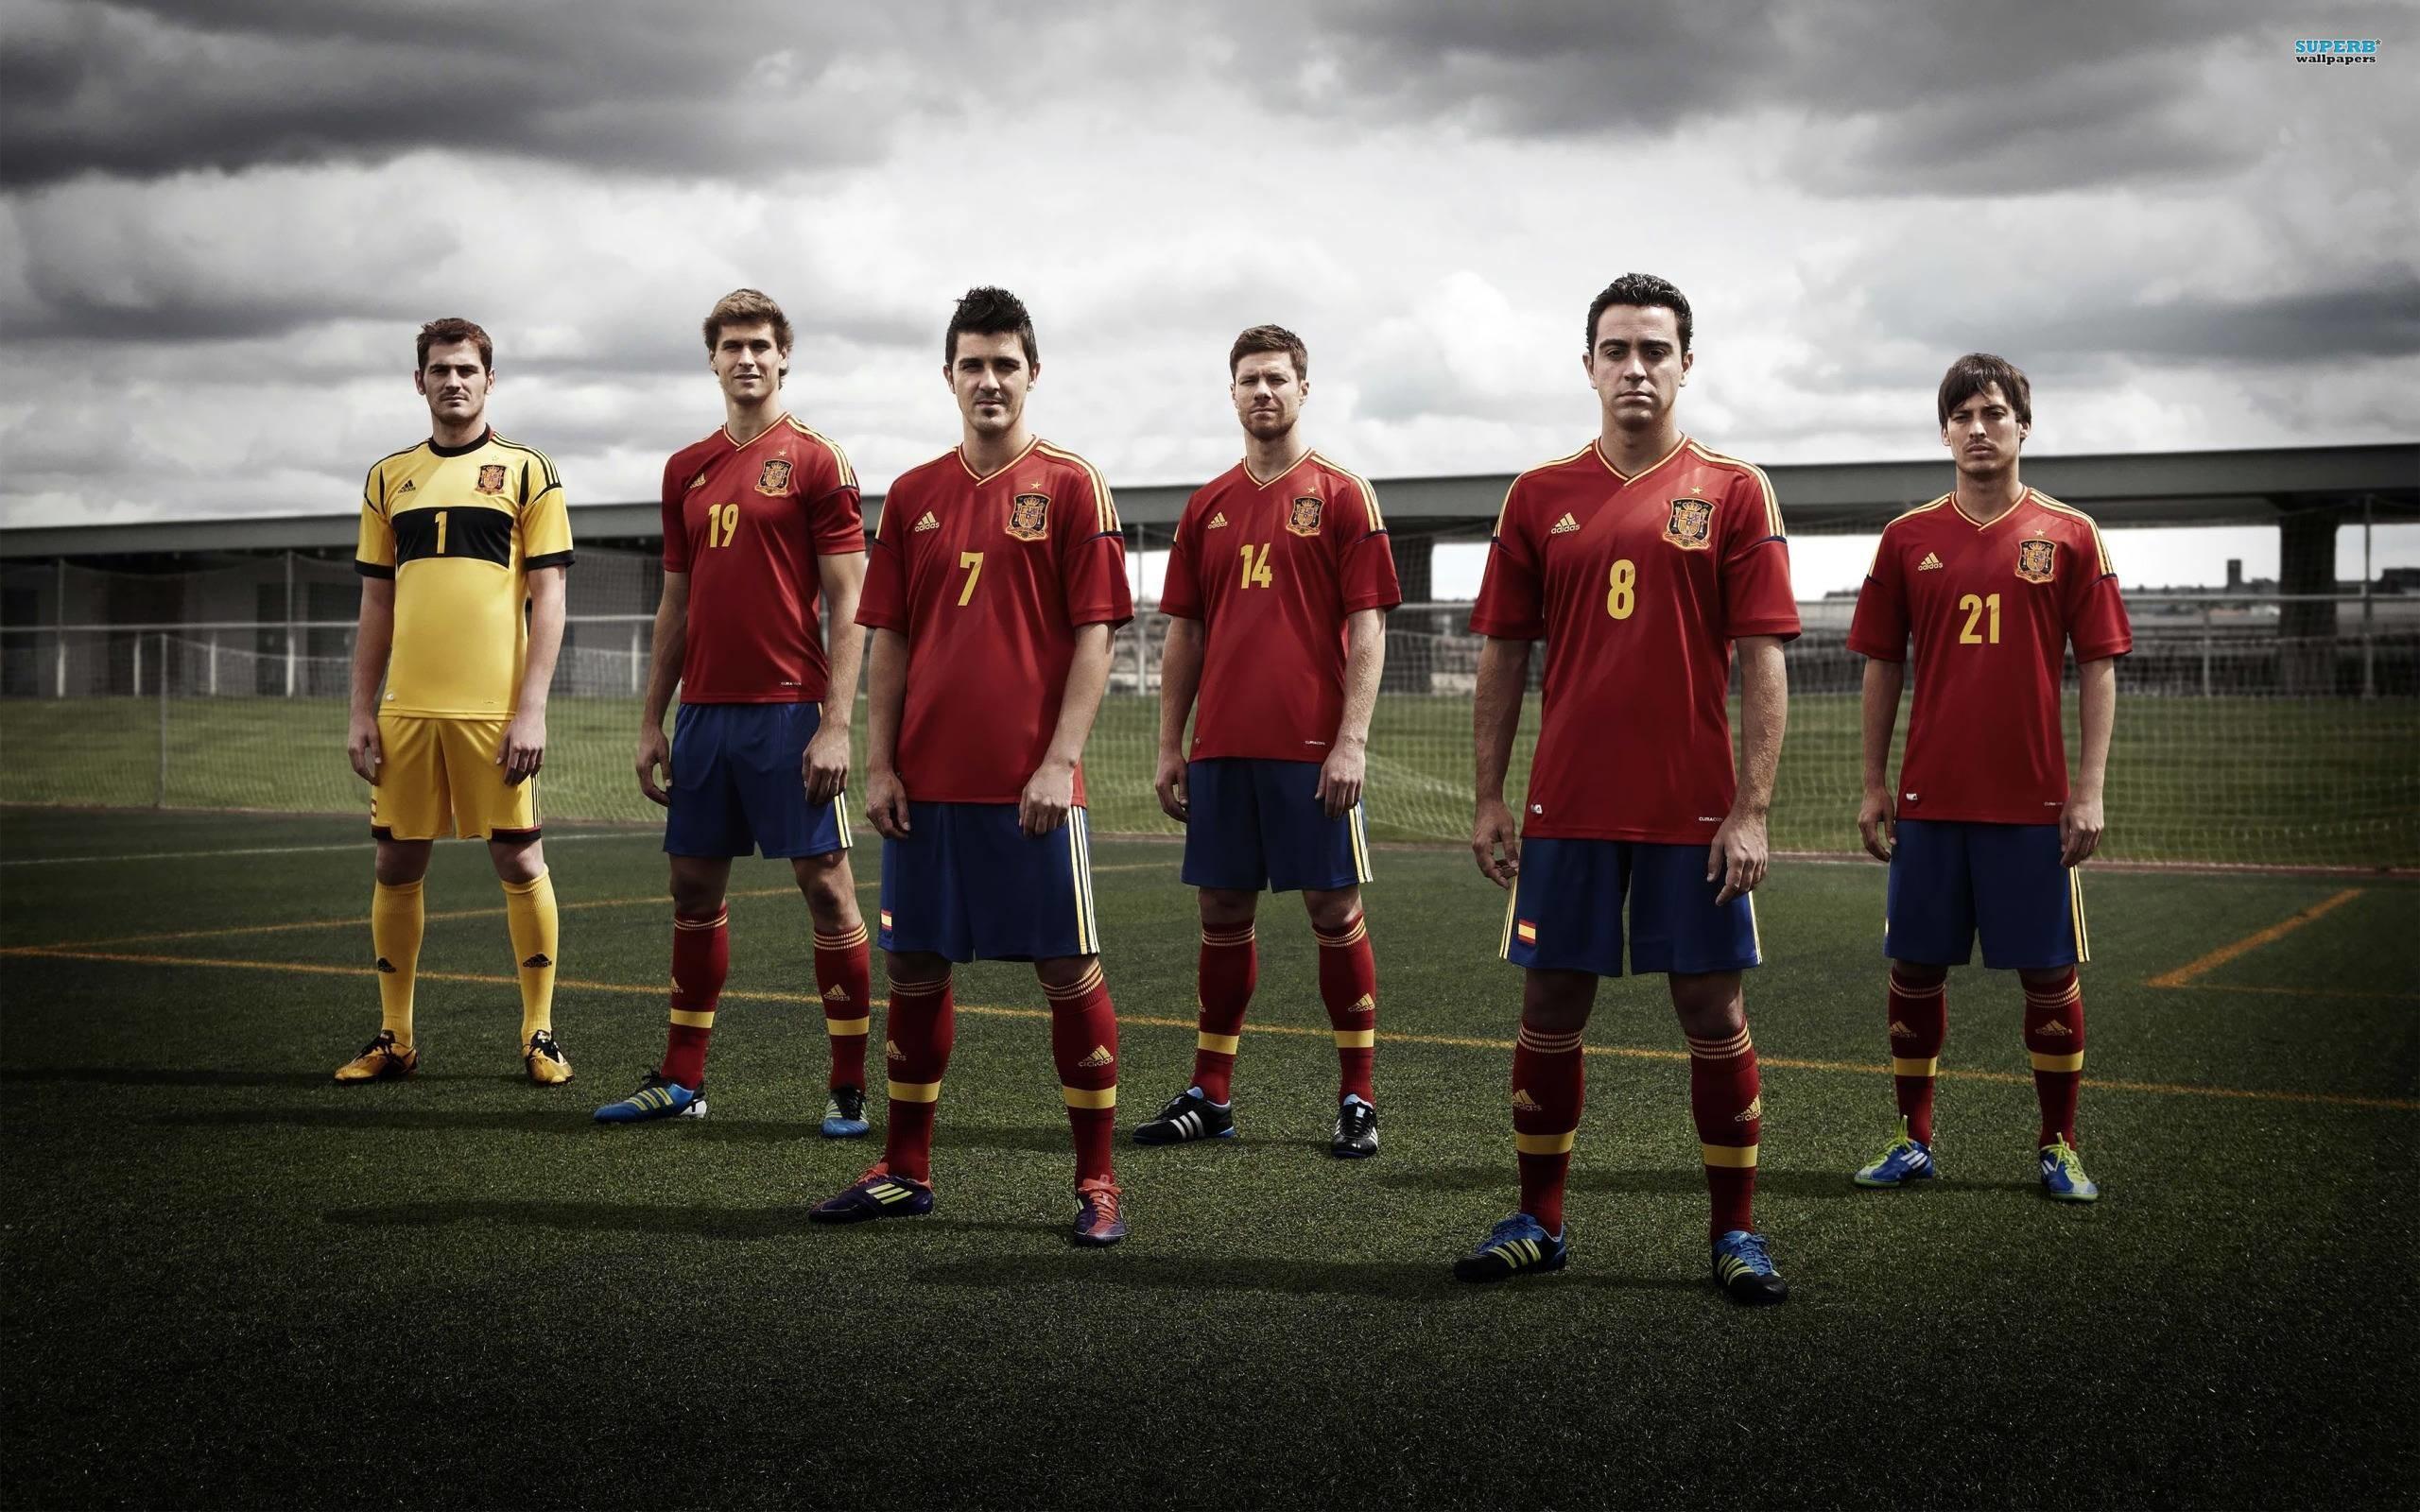 Spain national football team 2012 wallpaper – Sport wallpapers – #